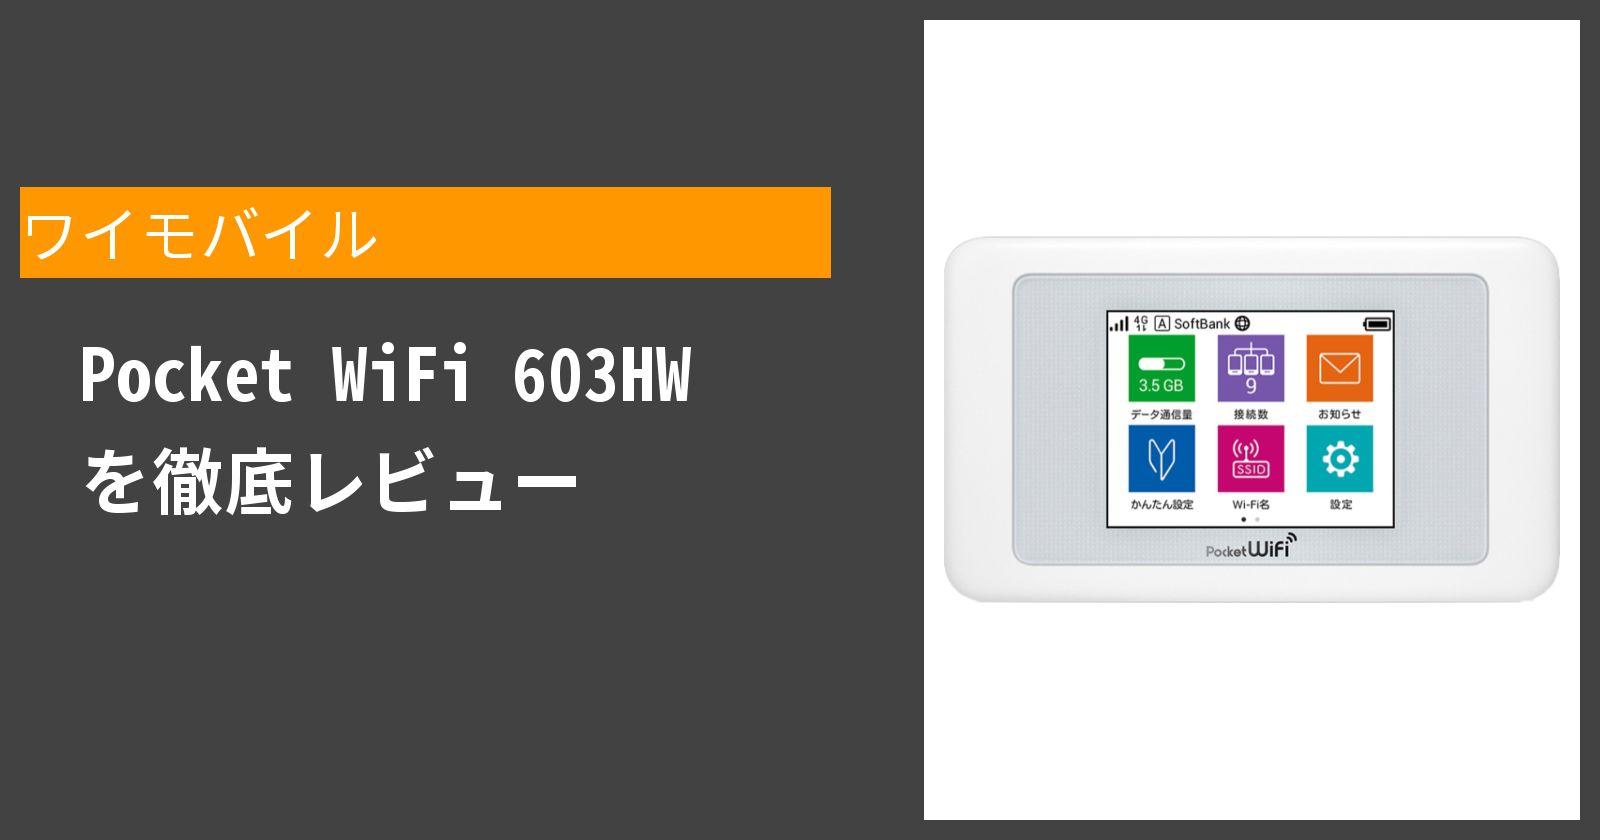 Pocket WiFi 603HWを徹底評価